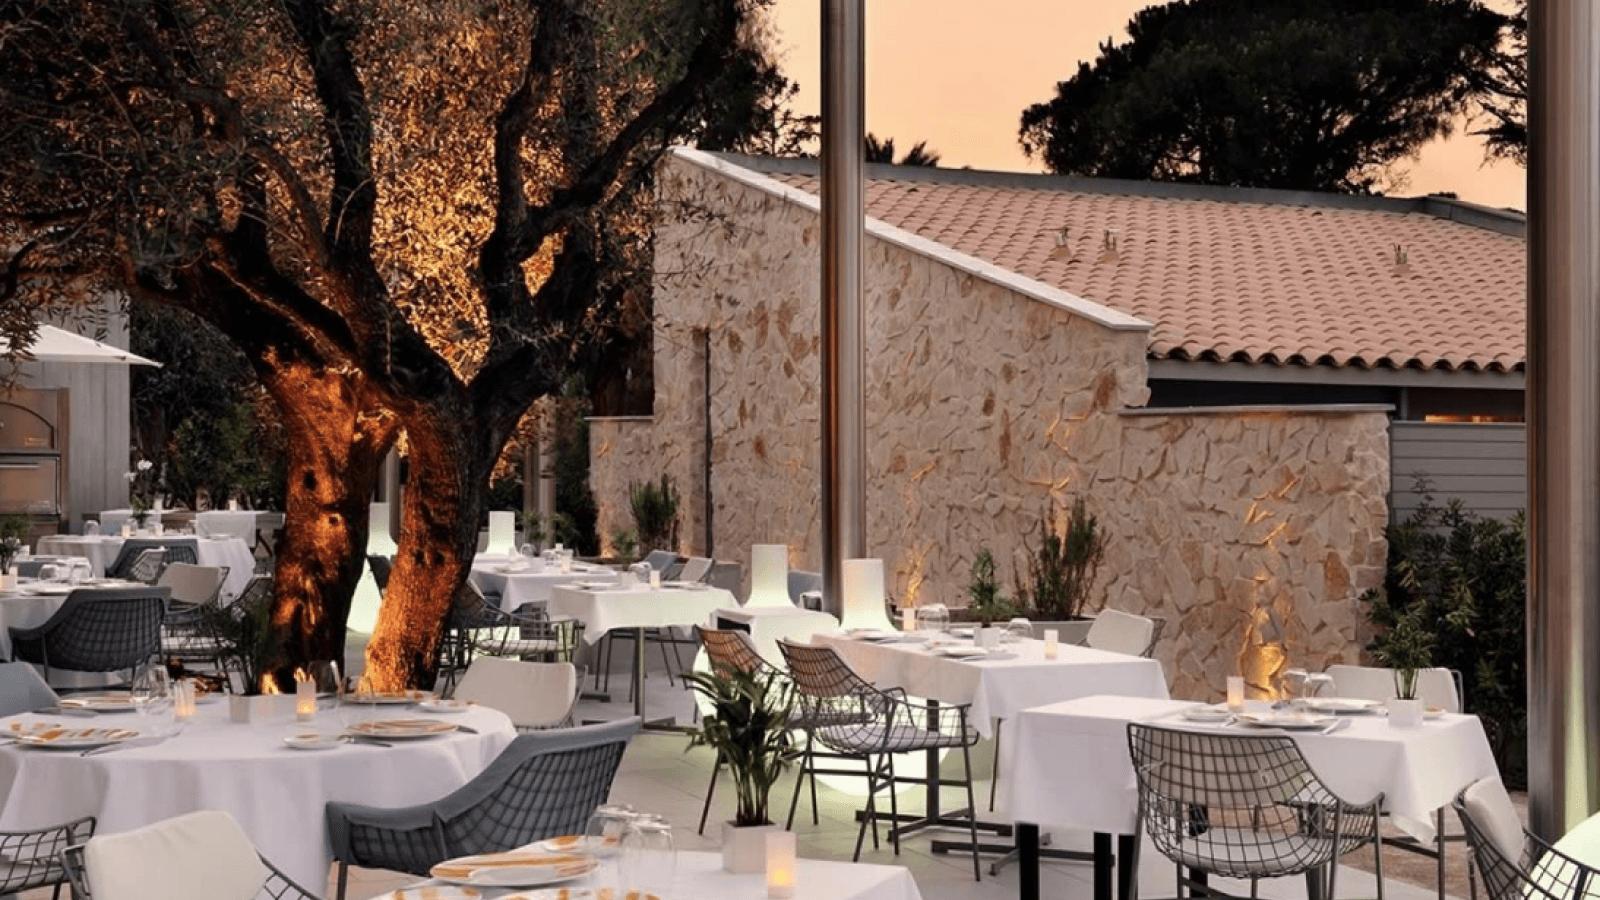 Incentive by Sezz Saint-Tropez